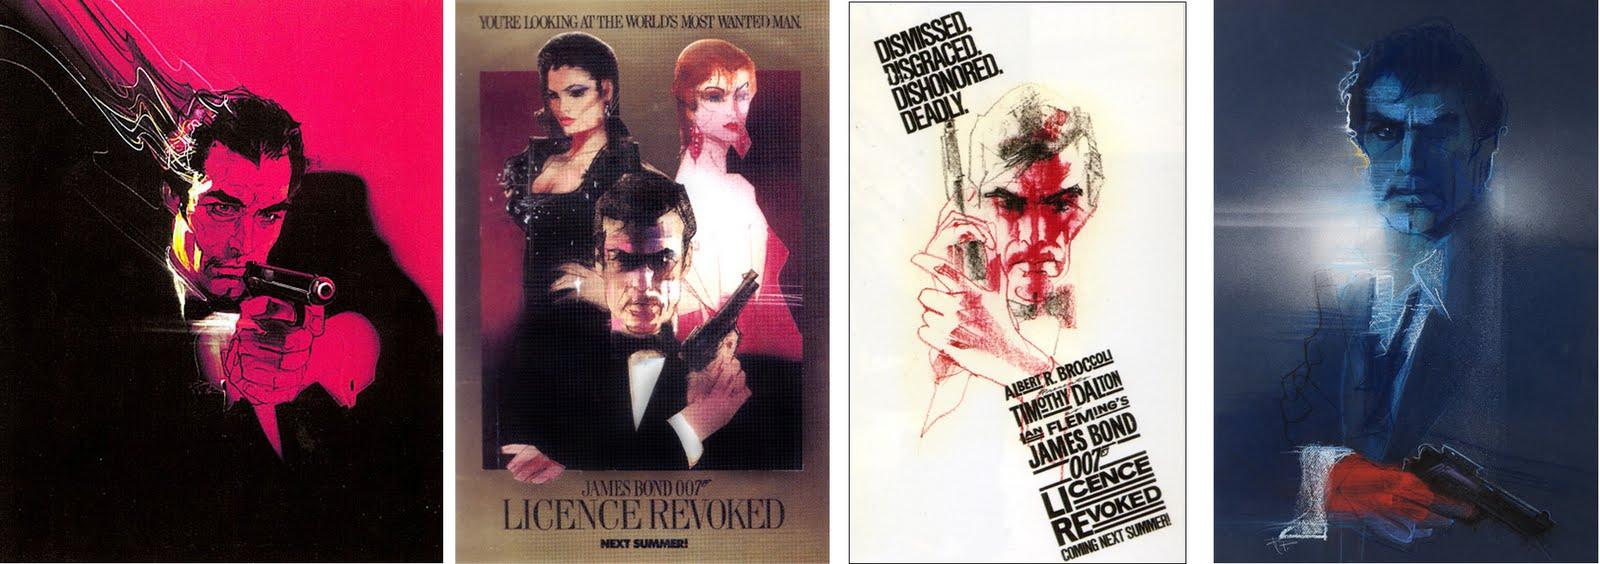 Licence to Kill artwork